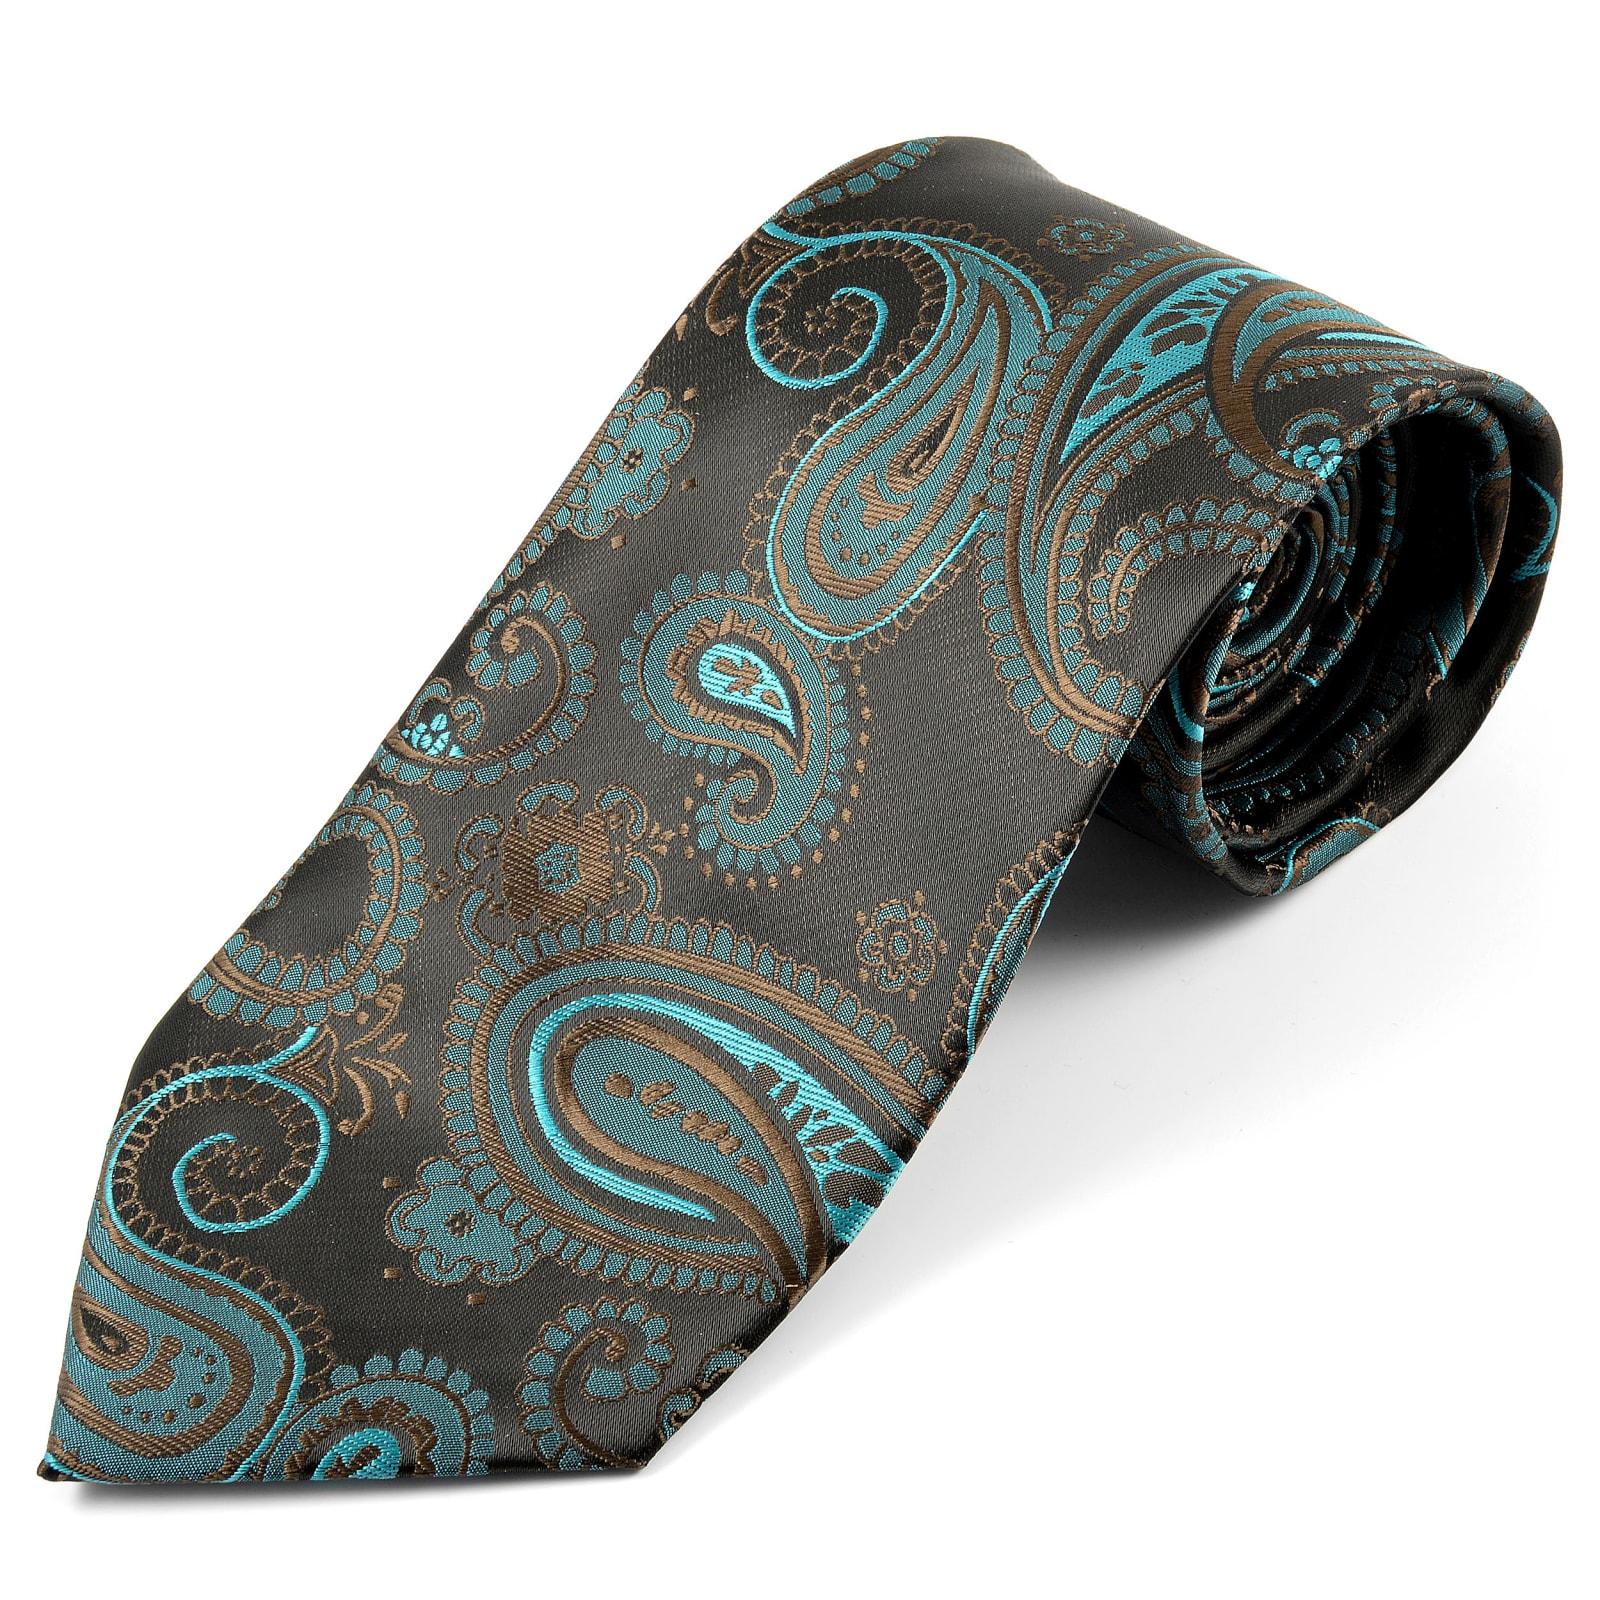 45fe8685ff8 Corbata ancha de seda con estampado de cachemir turquesa | ¡En stock! |  Tailor Toki